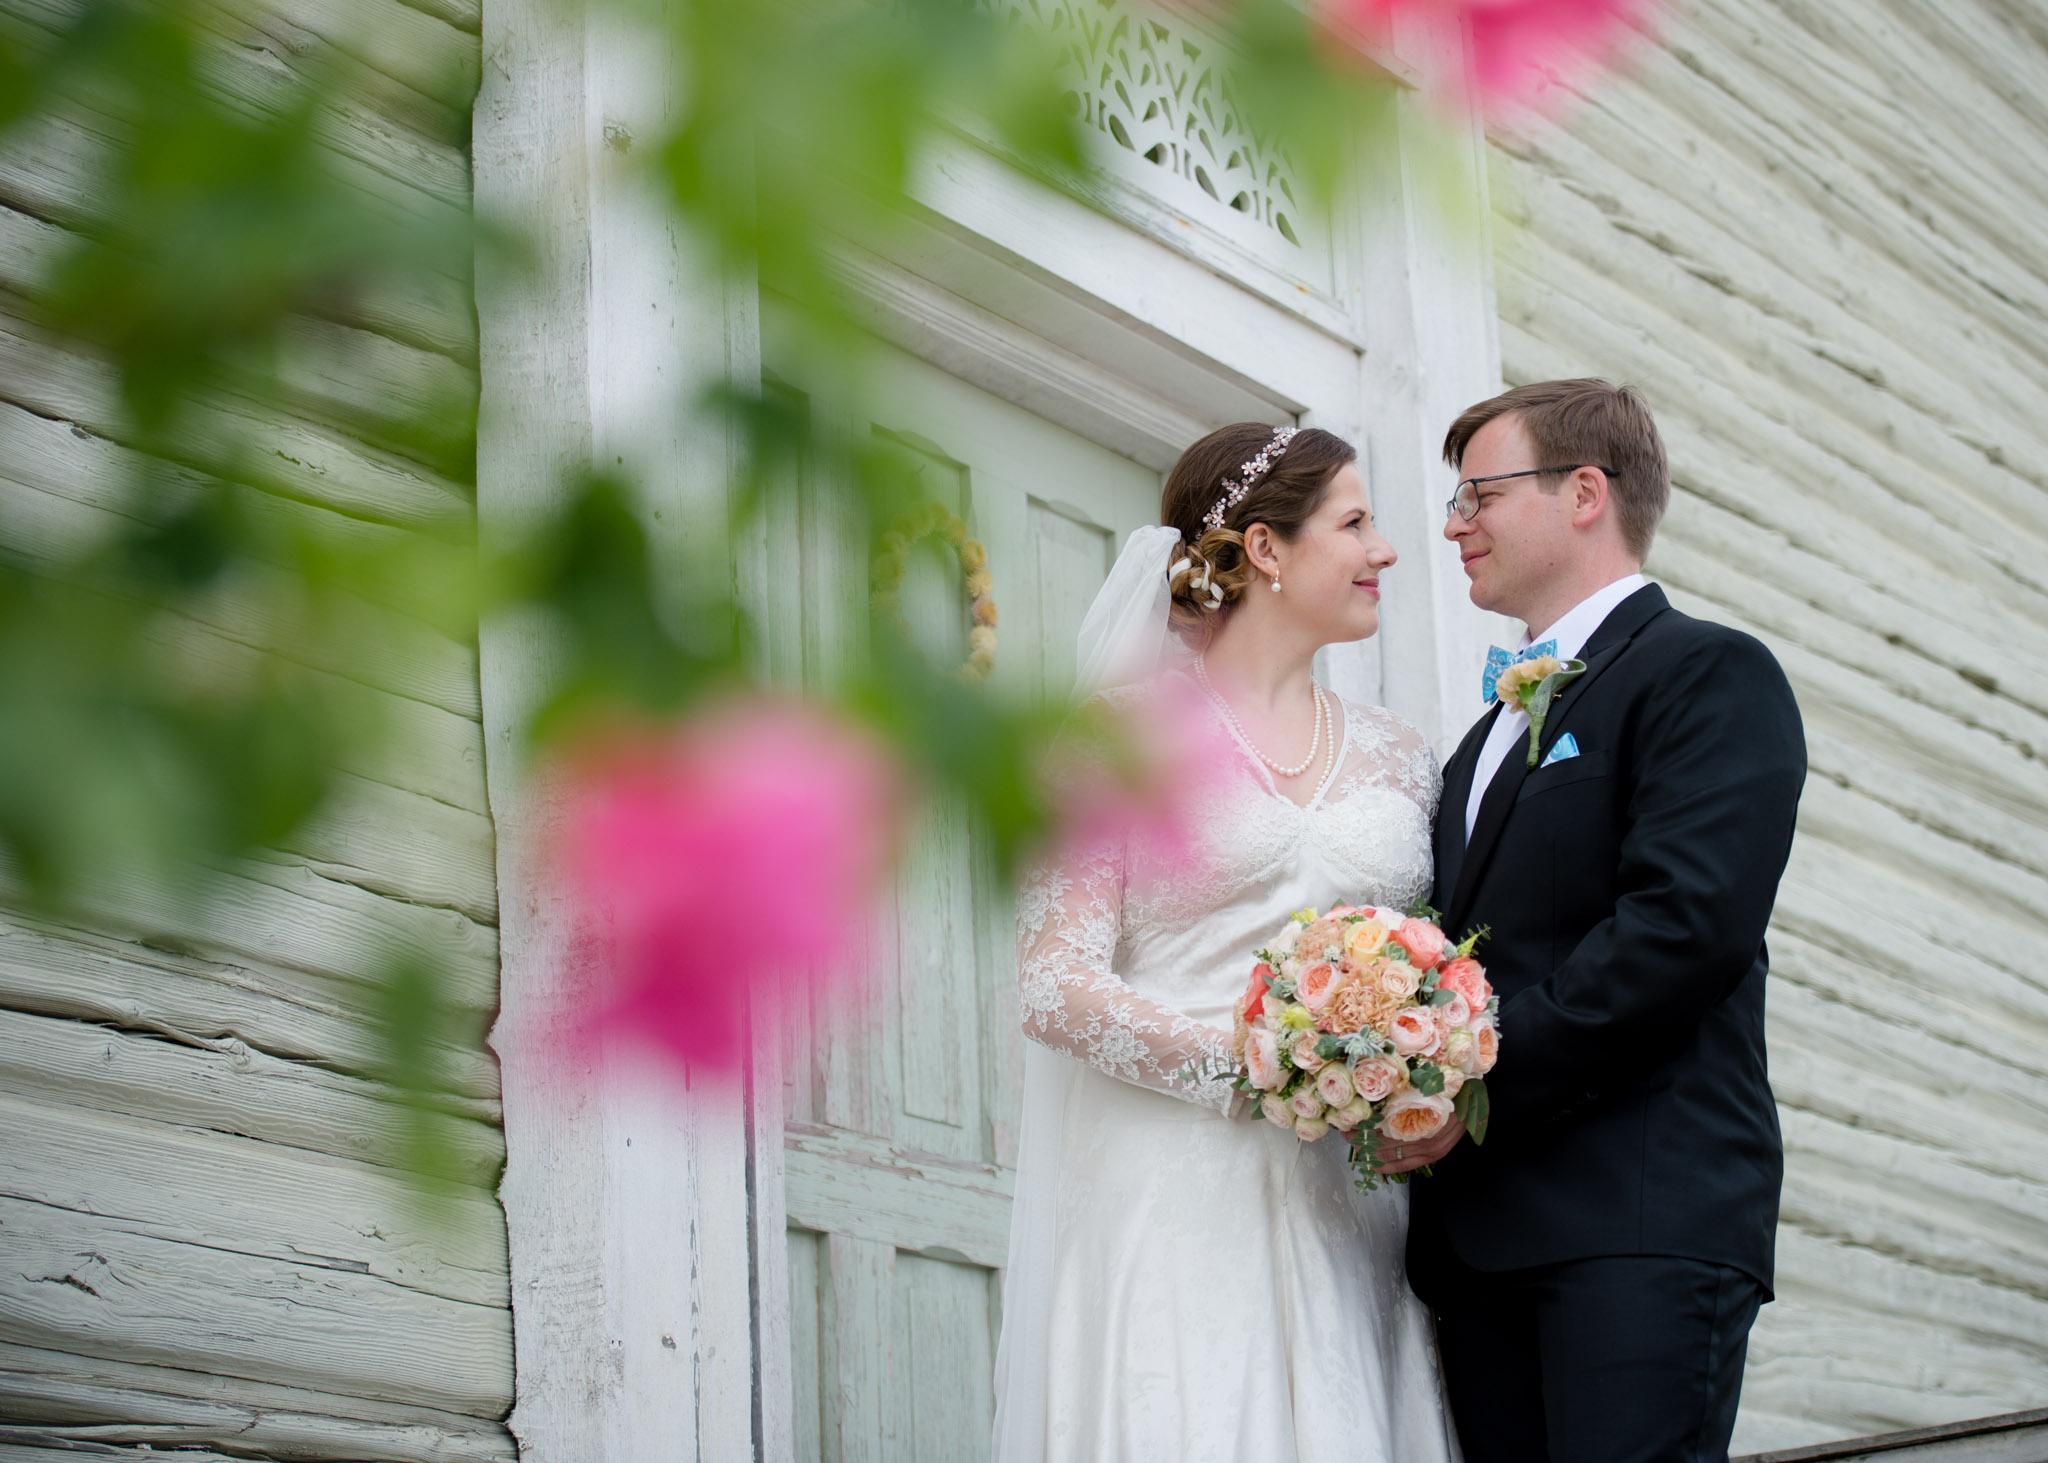 bryllupsfotograf-tønsberg-nøtterøy-fotograf-tjøme-vestfold-oslo-fotografvarpe--5917.JPG